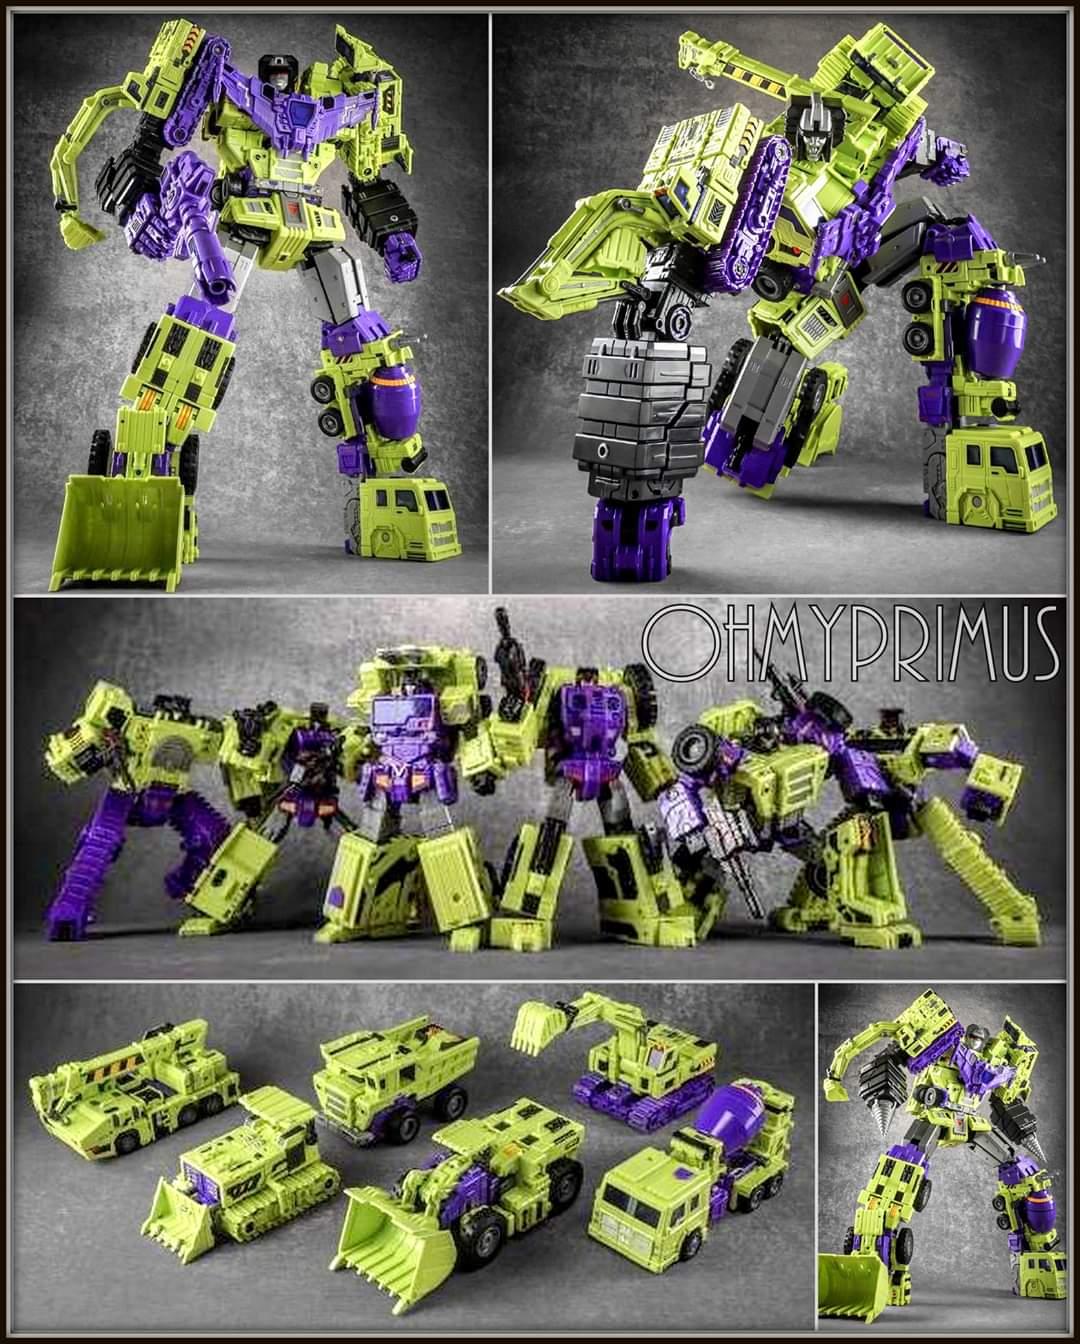 [Toyworld] Produit Tiers - Jouet TW-C Constructor aka Devastator/Dévastateur (Version vert G1 et jaune G2) - Page 11 8fYIiivW_o